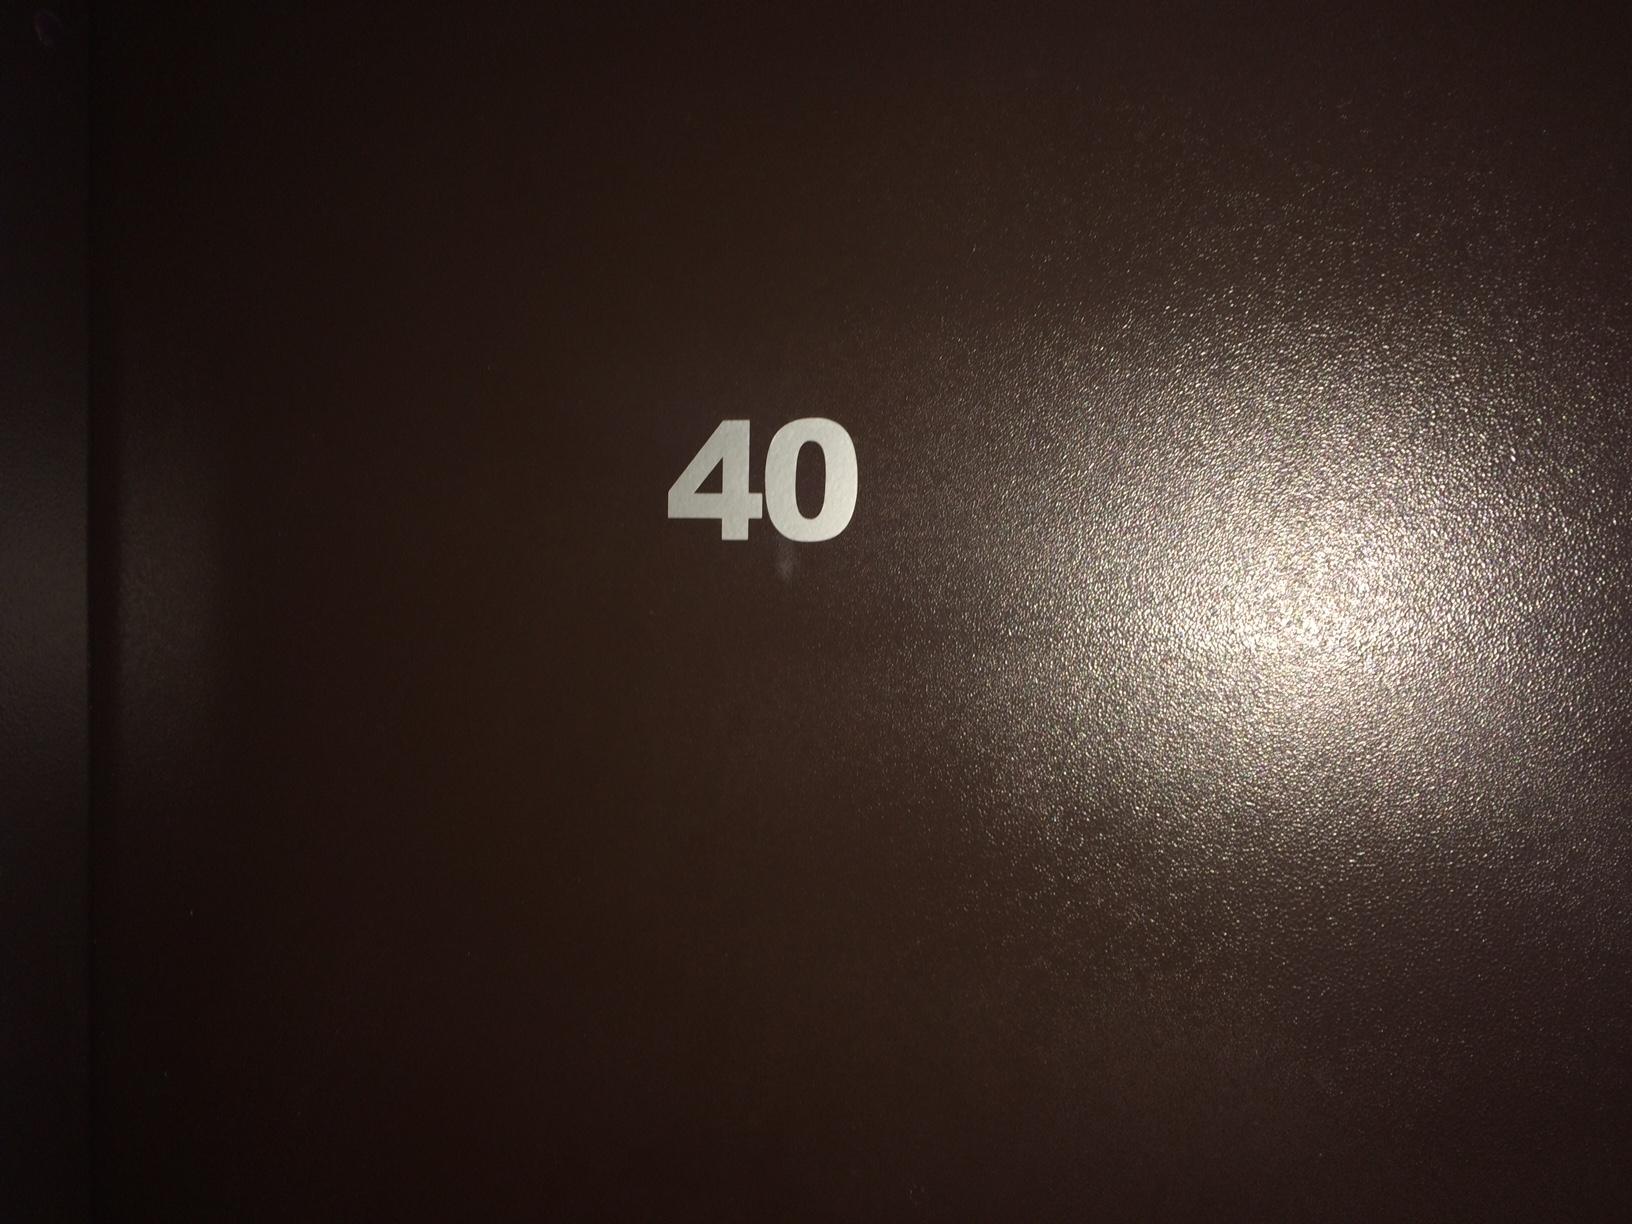 Boxa nr.40, Ansamblul Izvorul Dorului, Sinaia